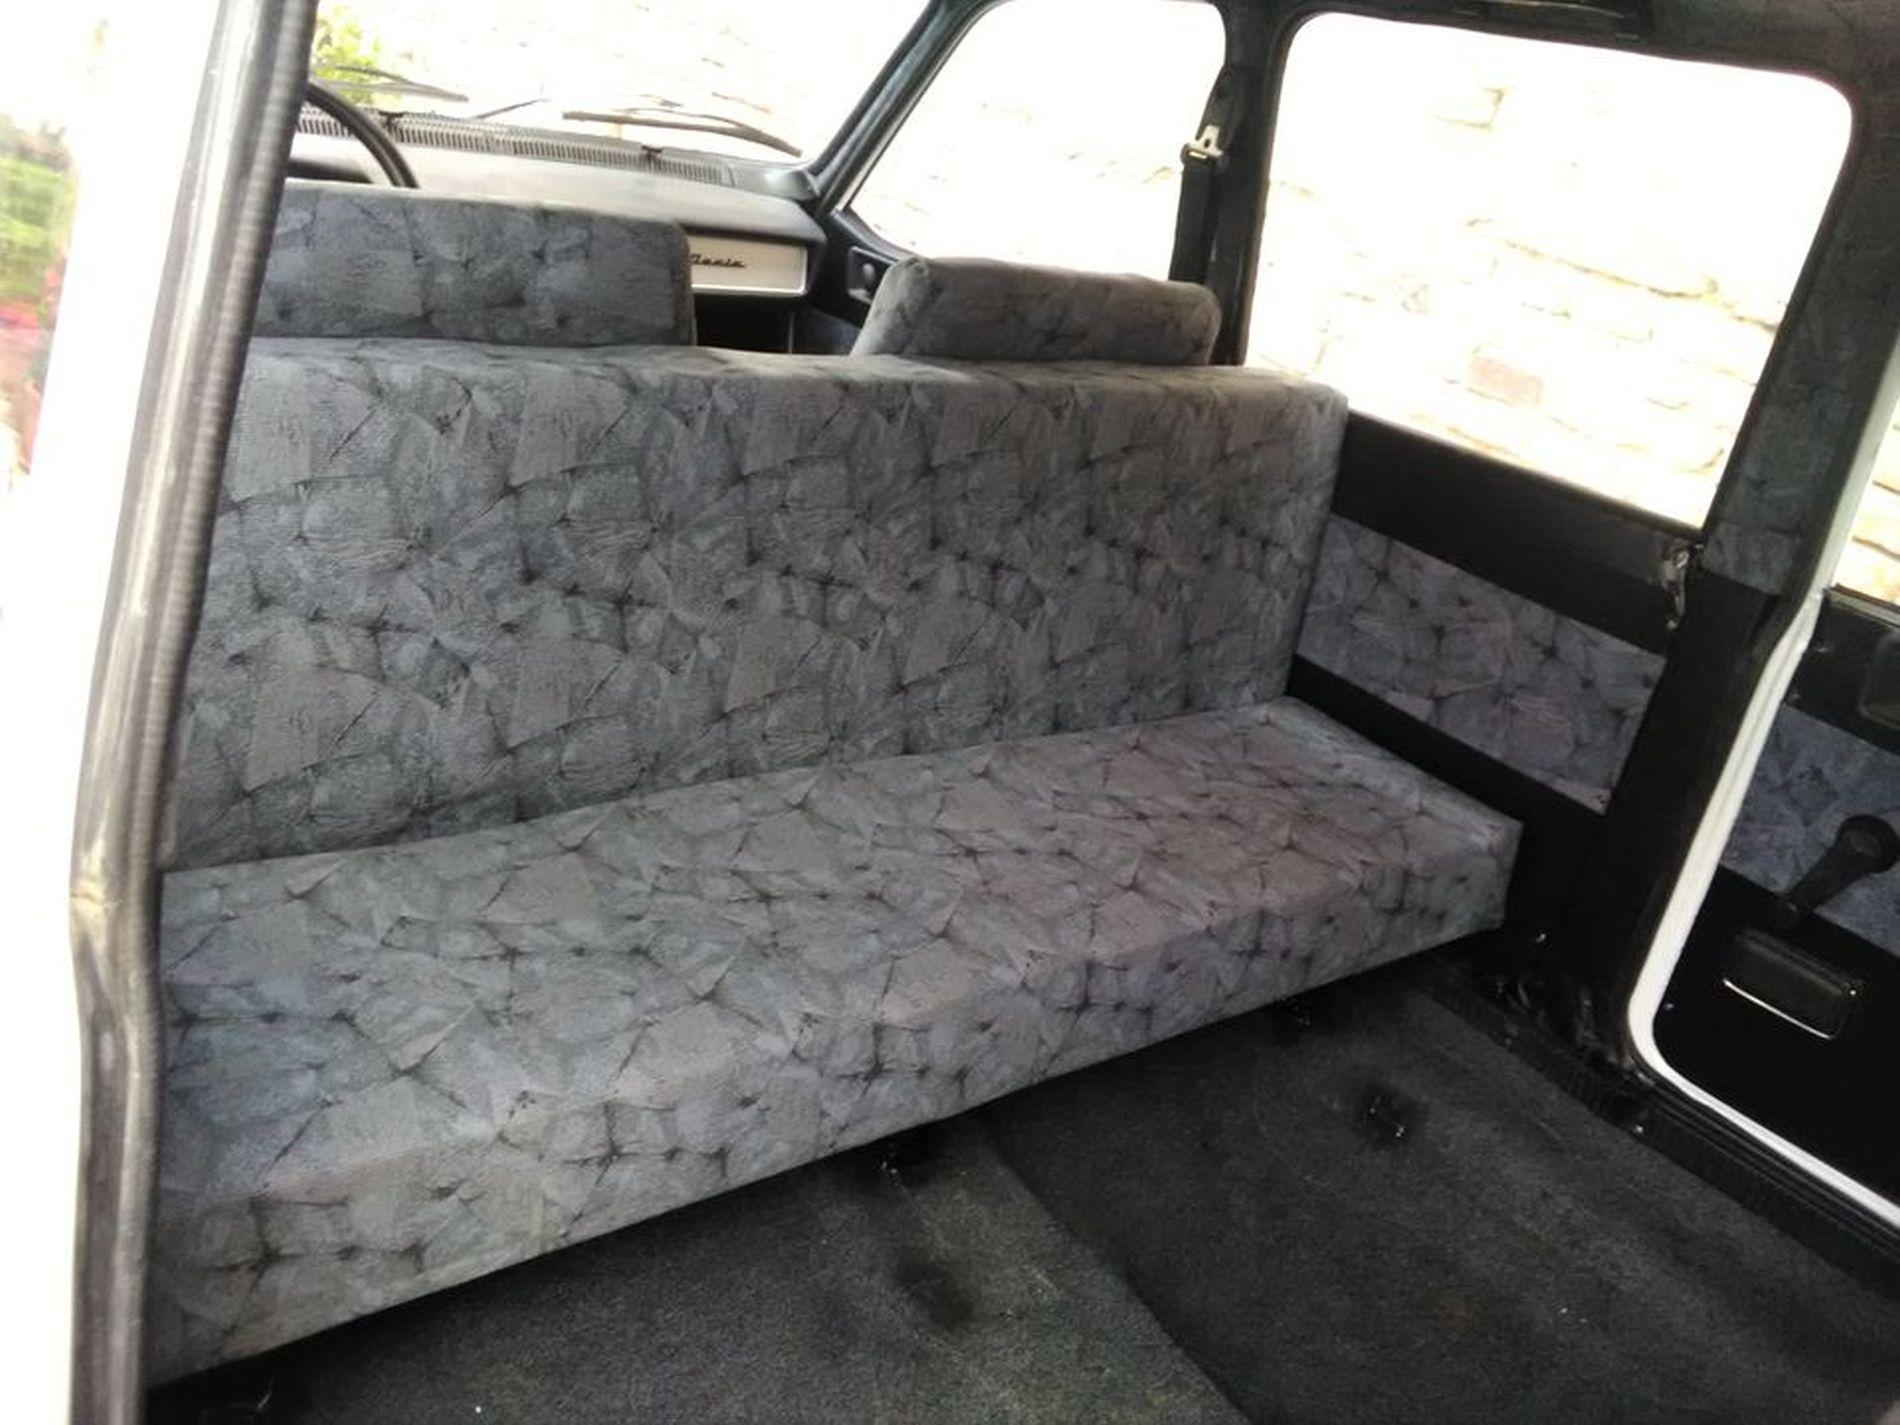 Raritate - un exemplar Dacia Maxibreak  a fost scos la vânzare